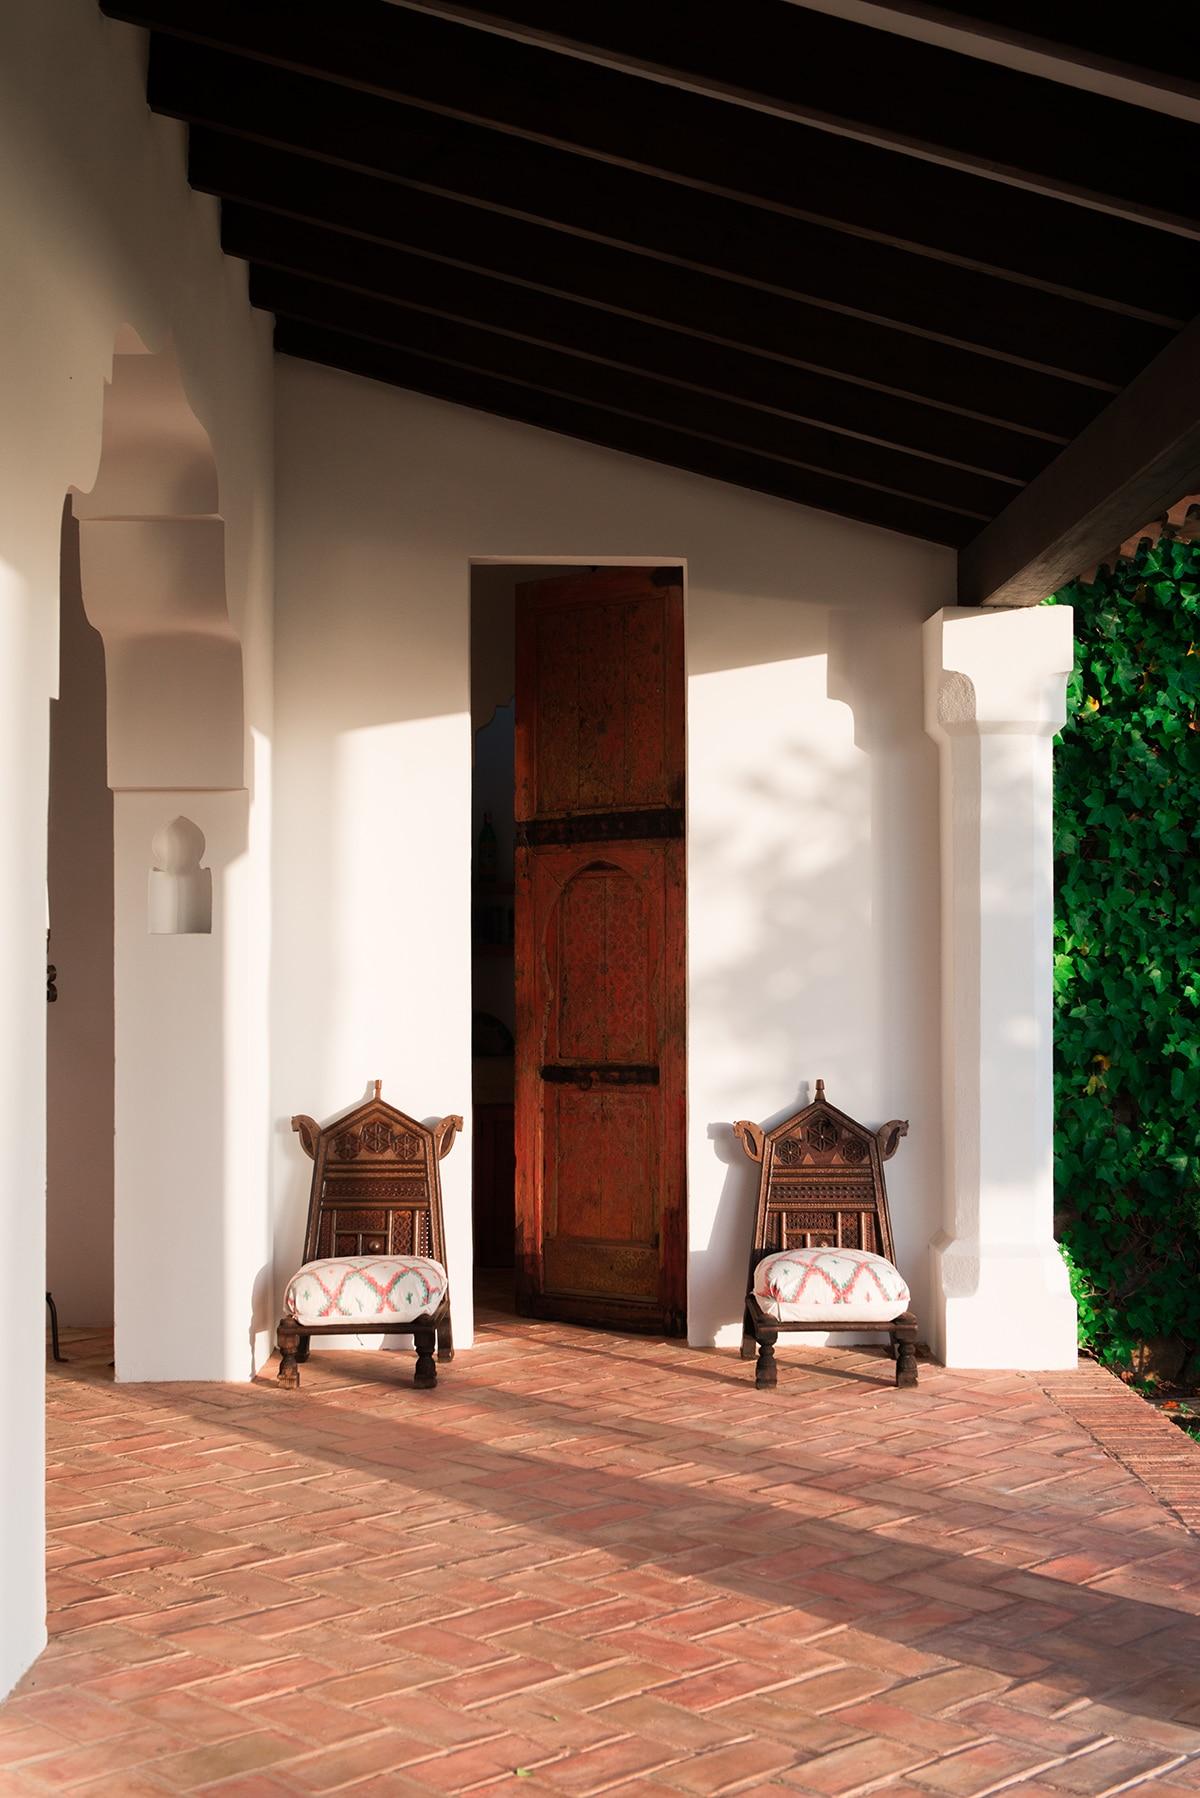 Diandra Douglas en su casa de Mallorca - Luxury LifestyleDiandra Douglas Zack Bacon